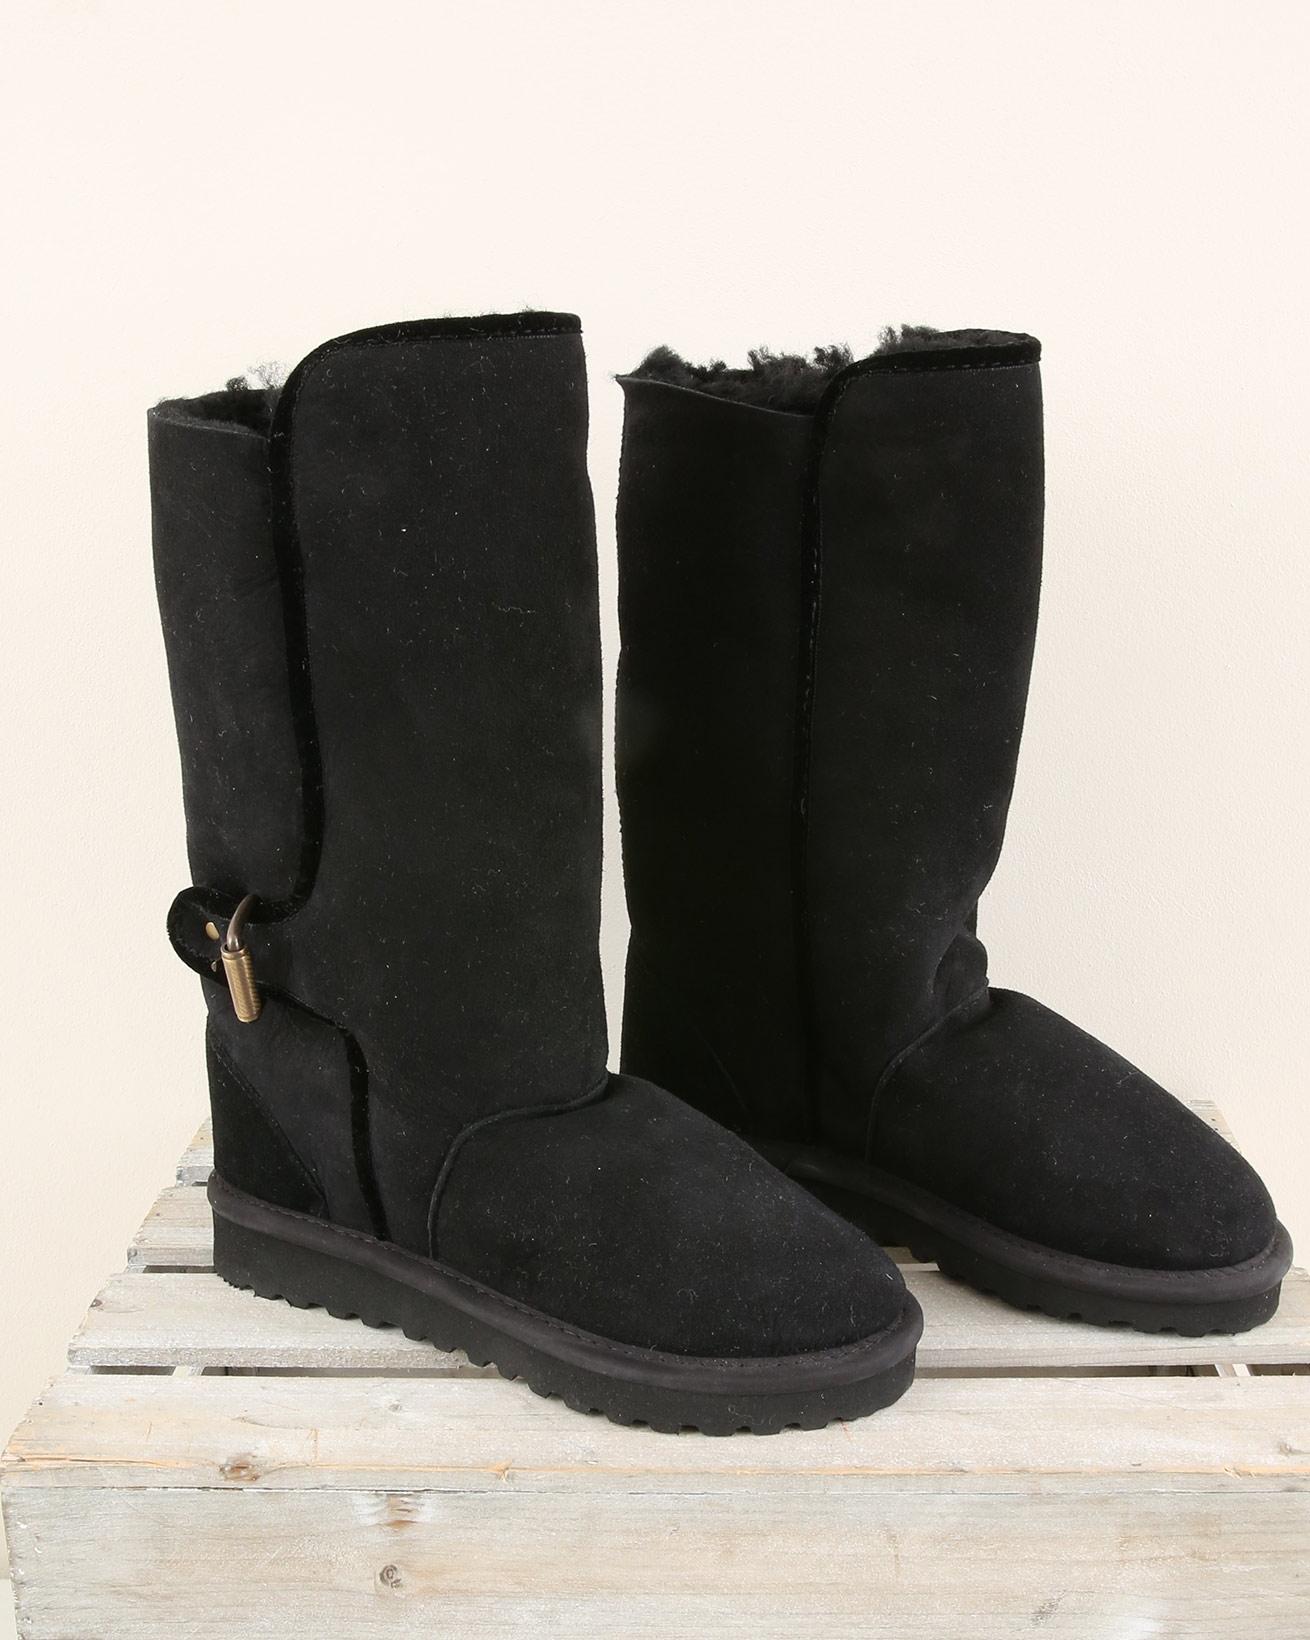 Slim Fit Cavalier Sheepskin Boot - Size 6 - Black - 1990